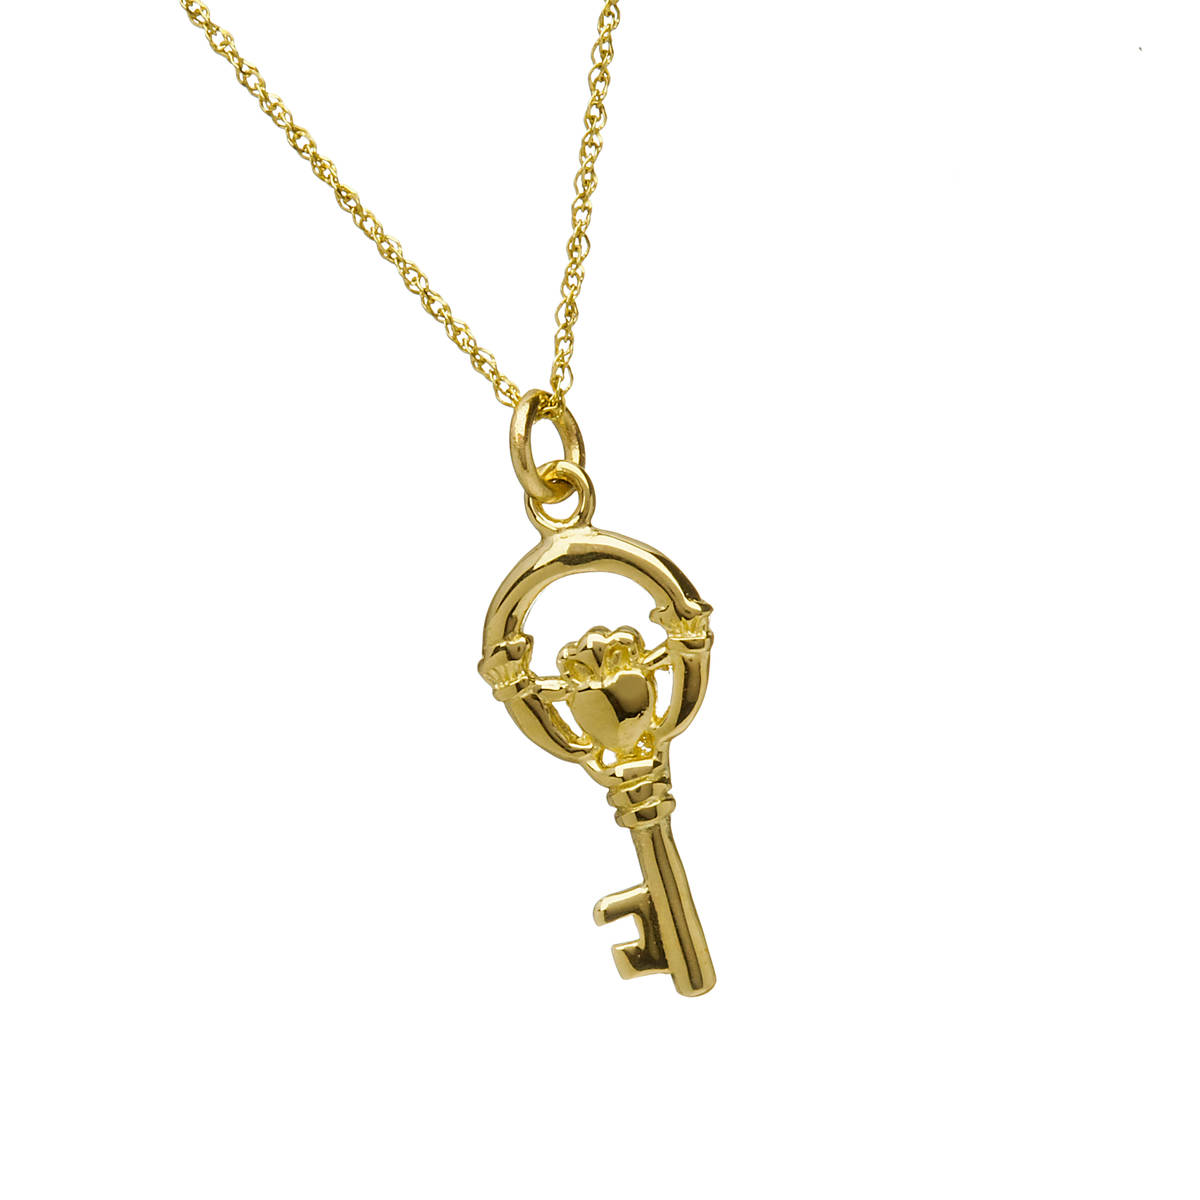 10 carat Claddagh key charm pendant